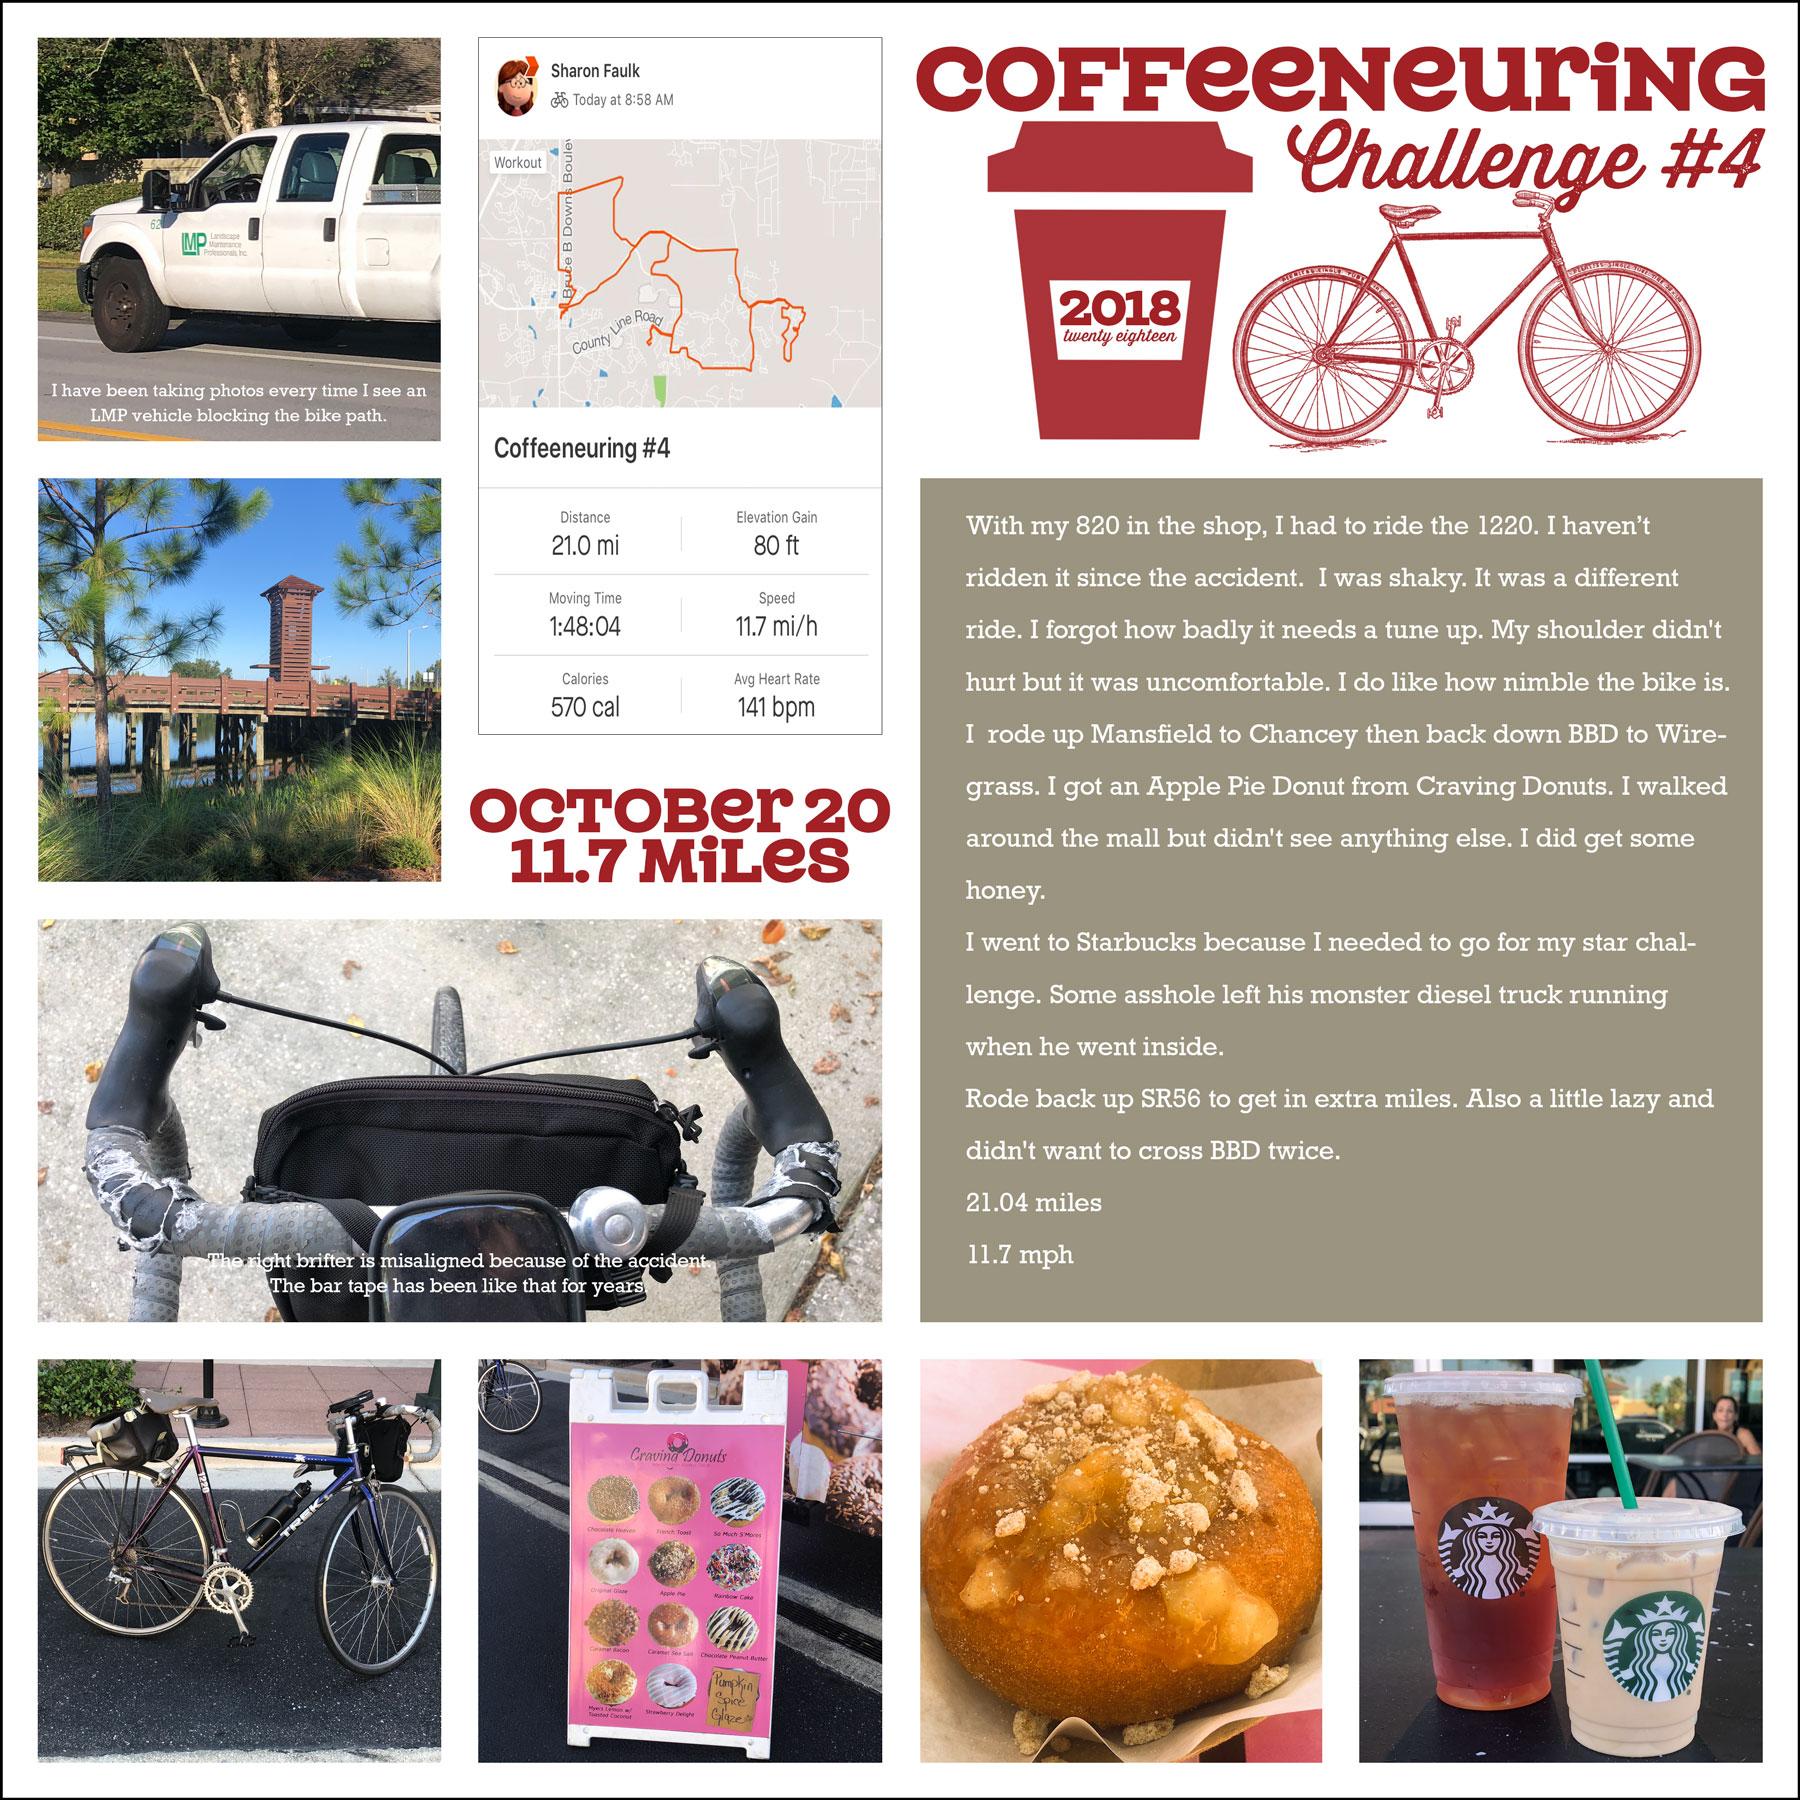 20181020-coffeeneuring.jpg